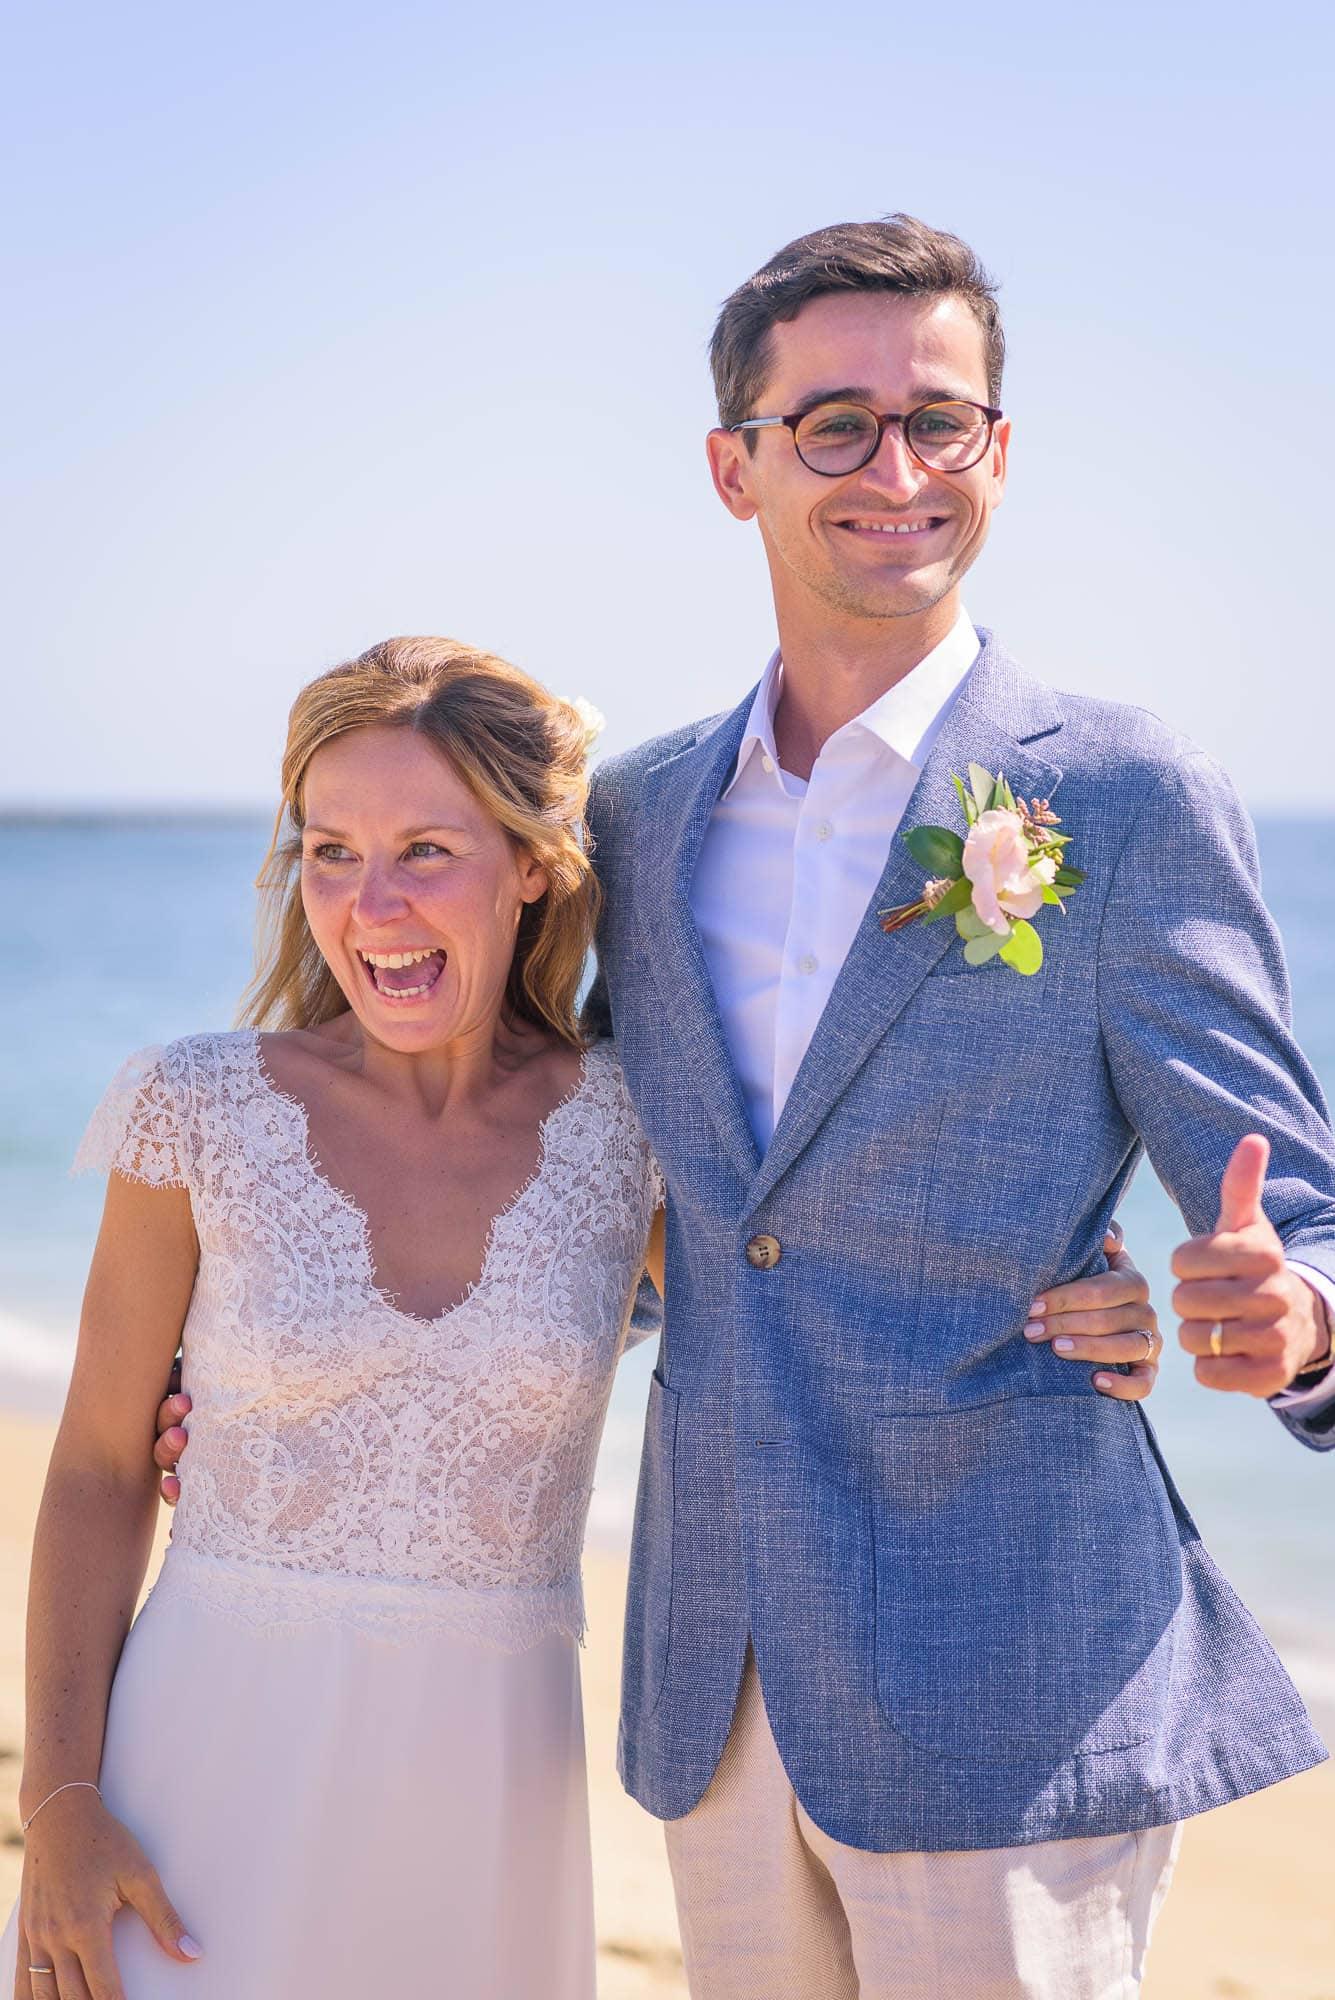 030_Alan_and_Heidi_Wedding_Verena_Andreas